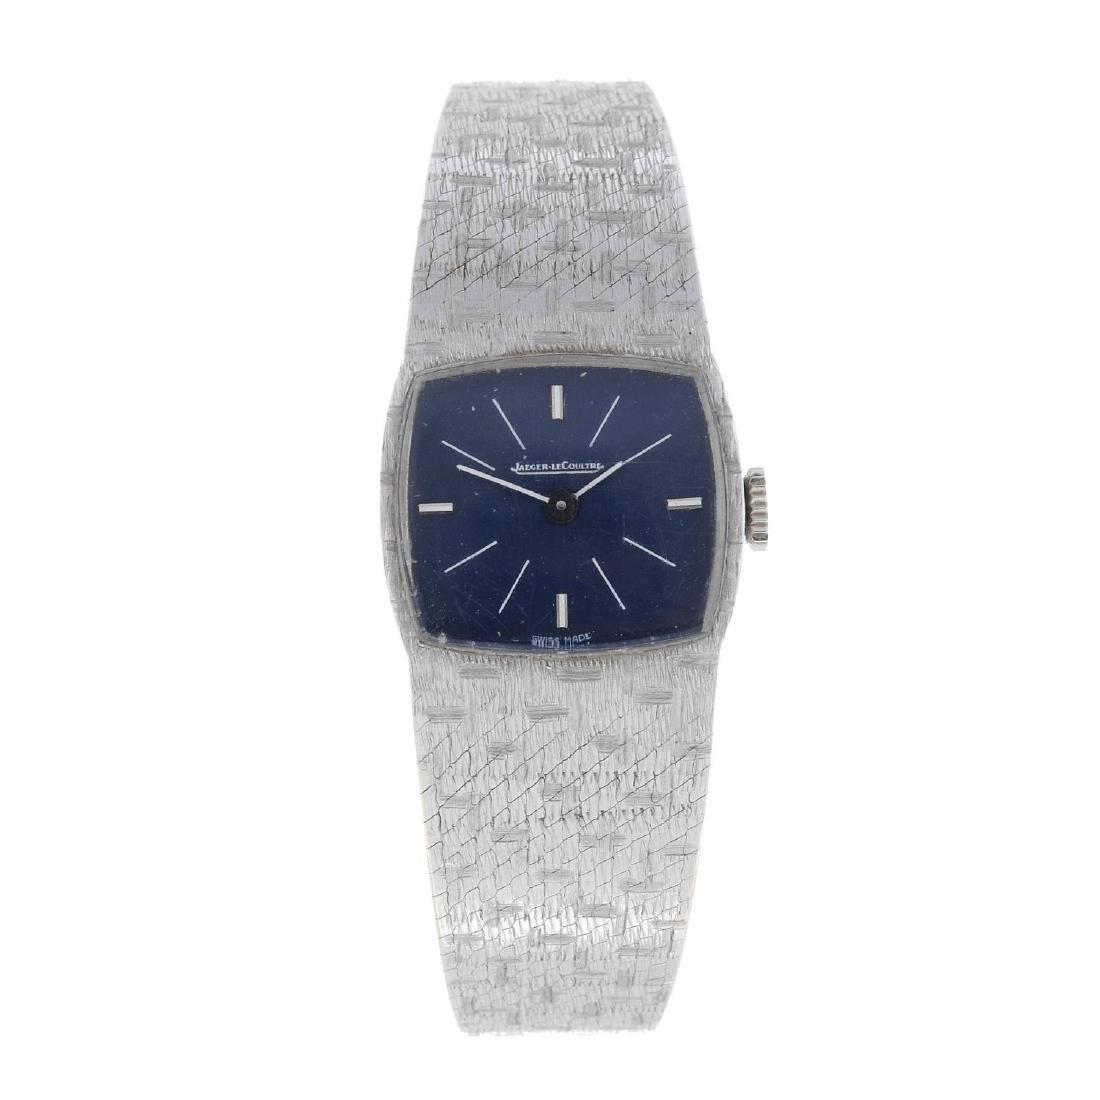 JAEGER-LECOULTRE - a lady's bracelet watch. White metal